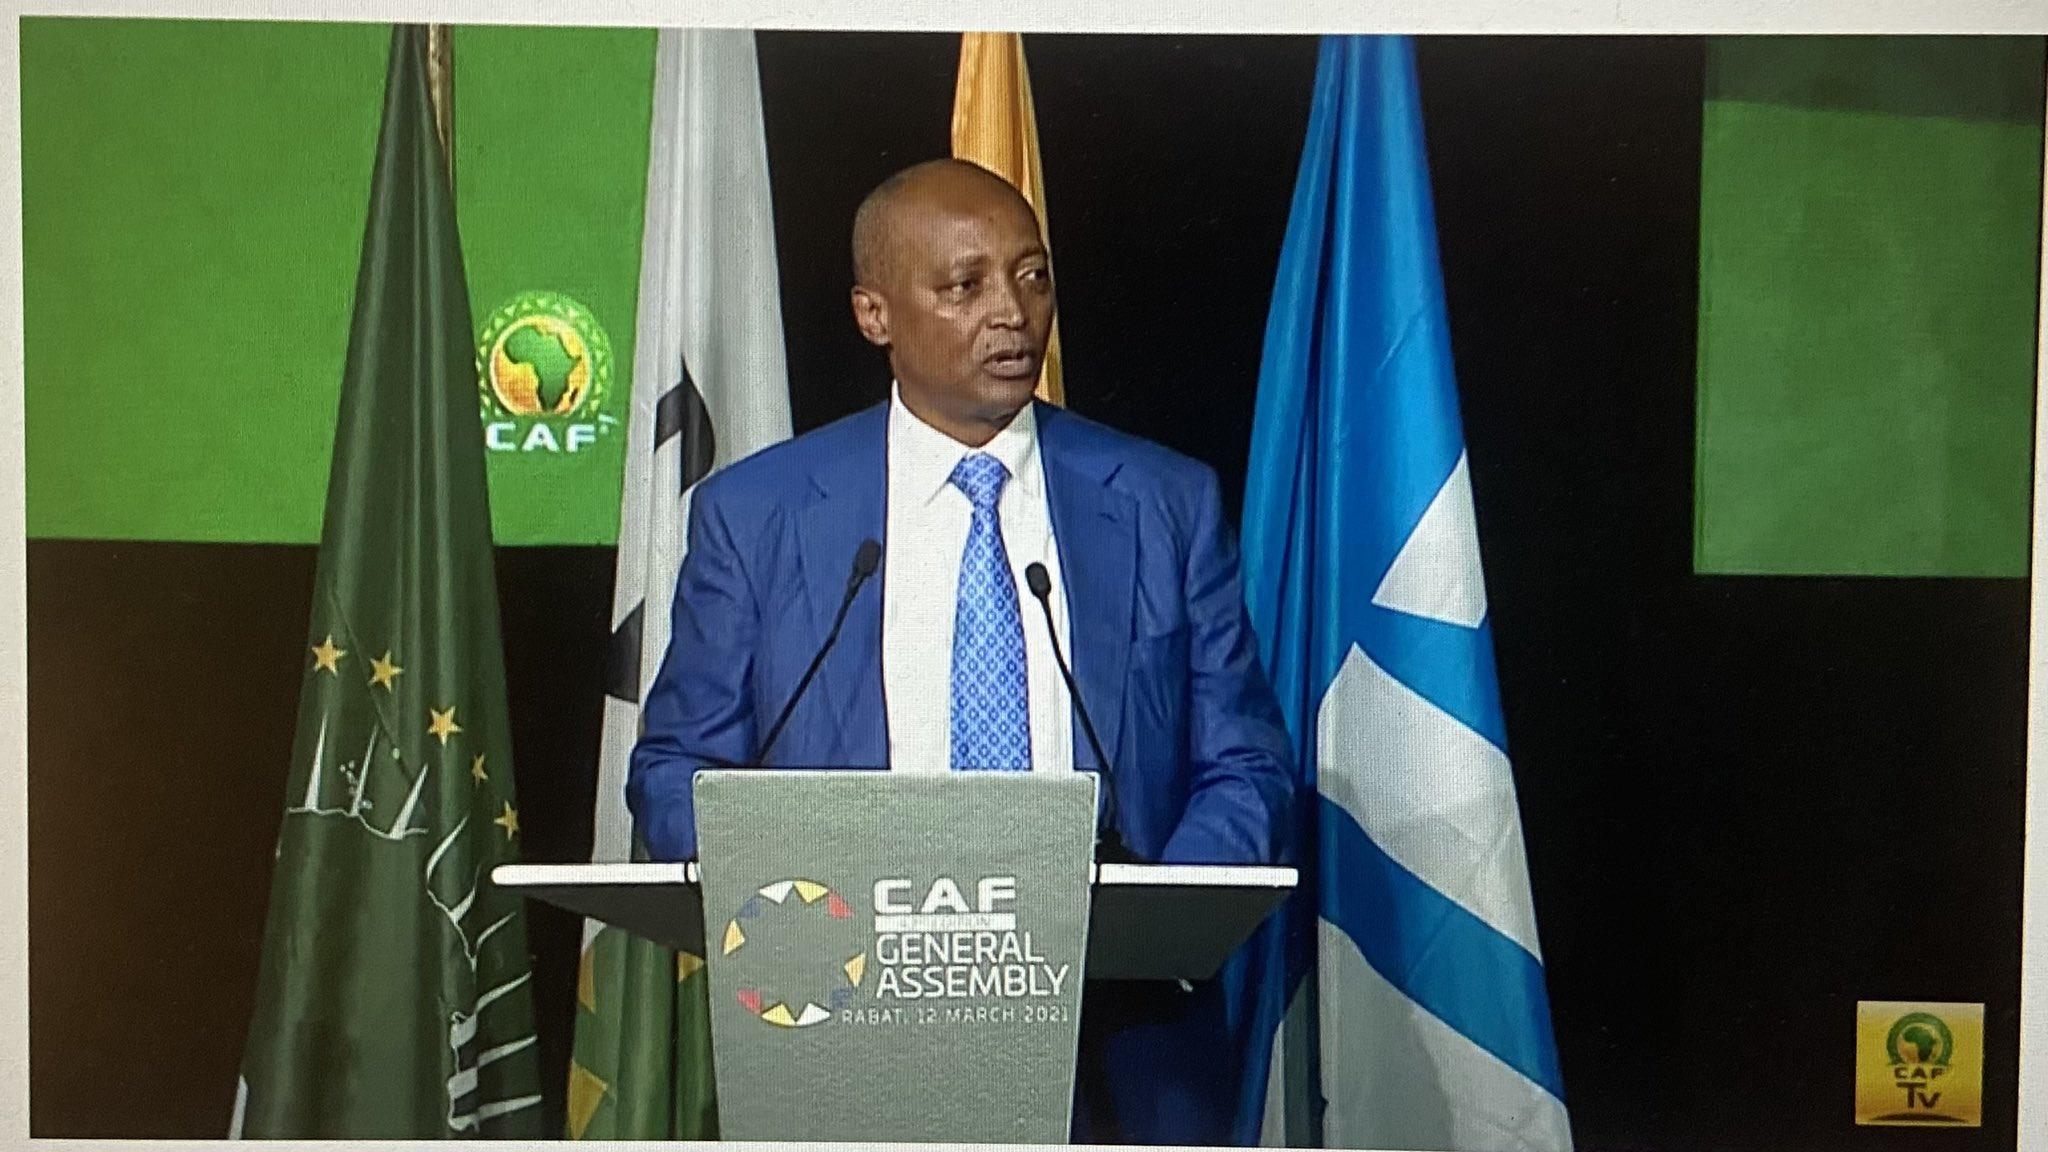 Motsepe - The CAF President Mr Patrice Motsepe Reviews His Plans For CAF Super League